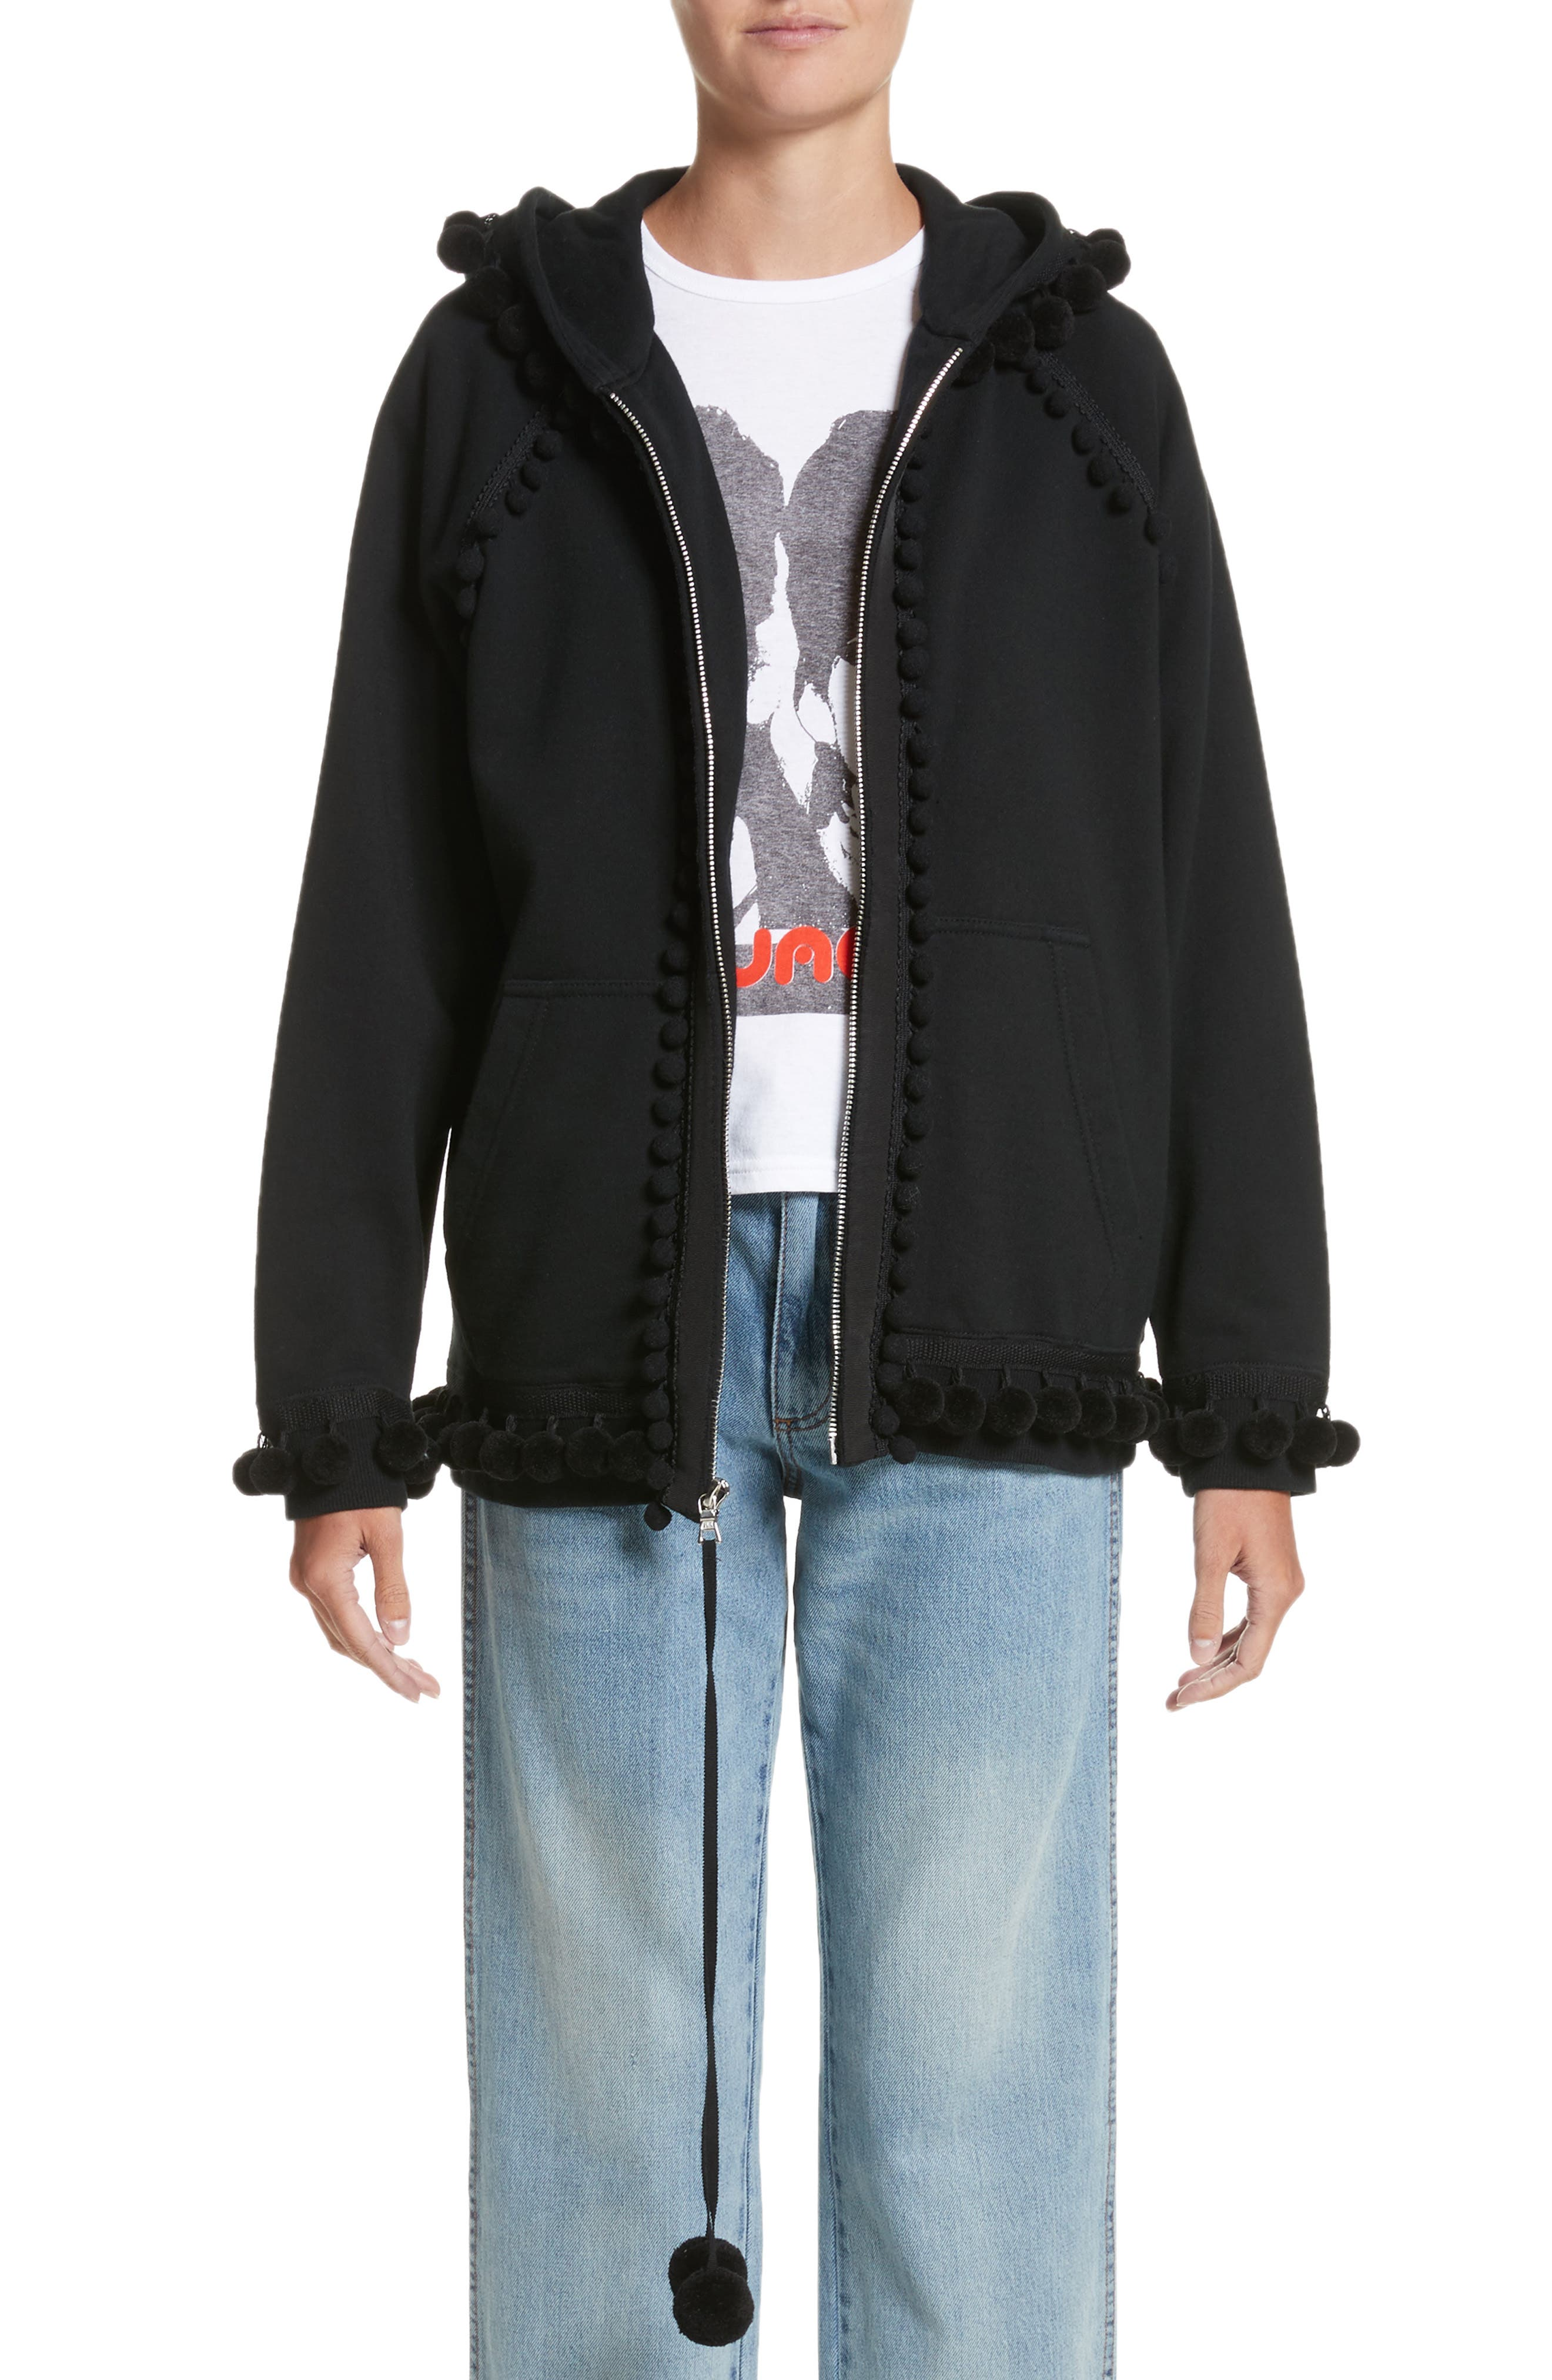 Pompom Trim Sweatshirt,                         Main,                         color, Black